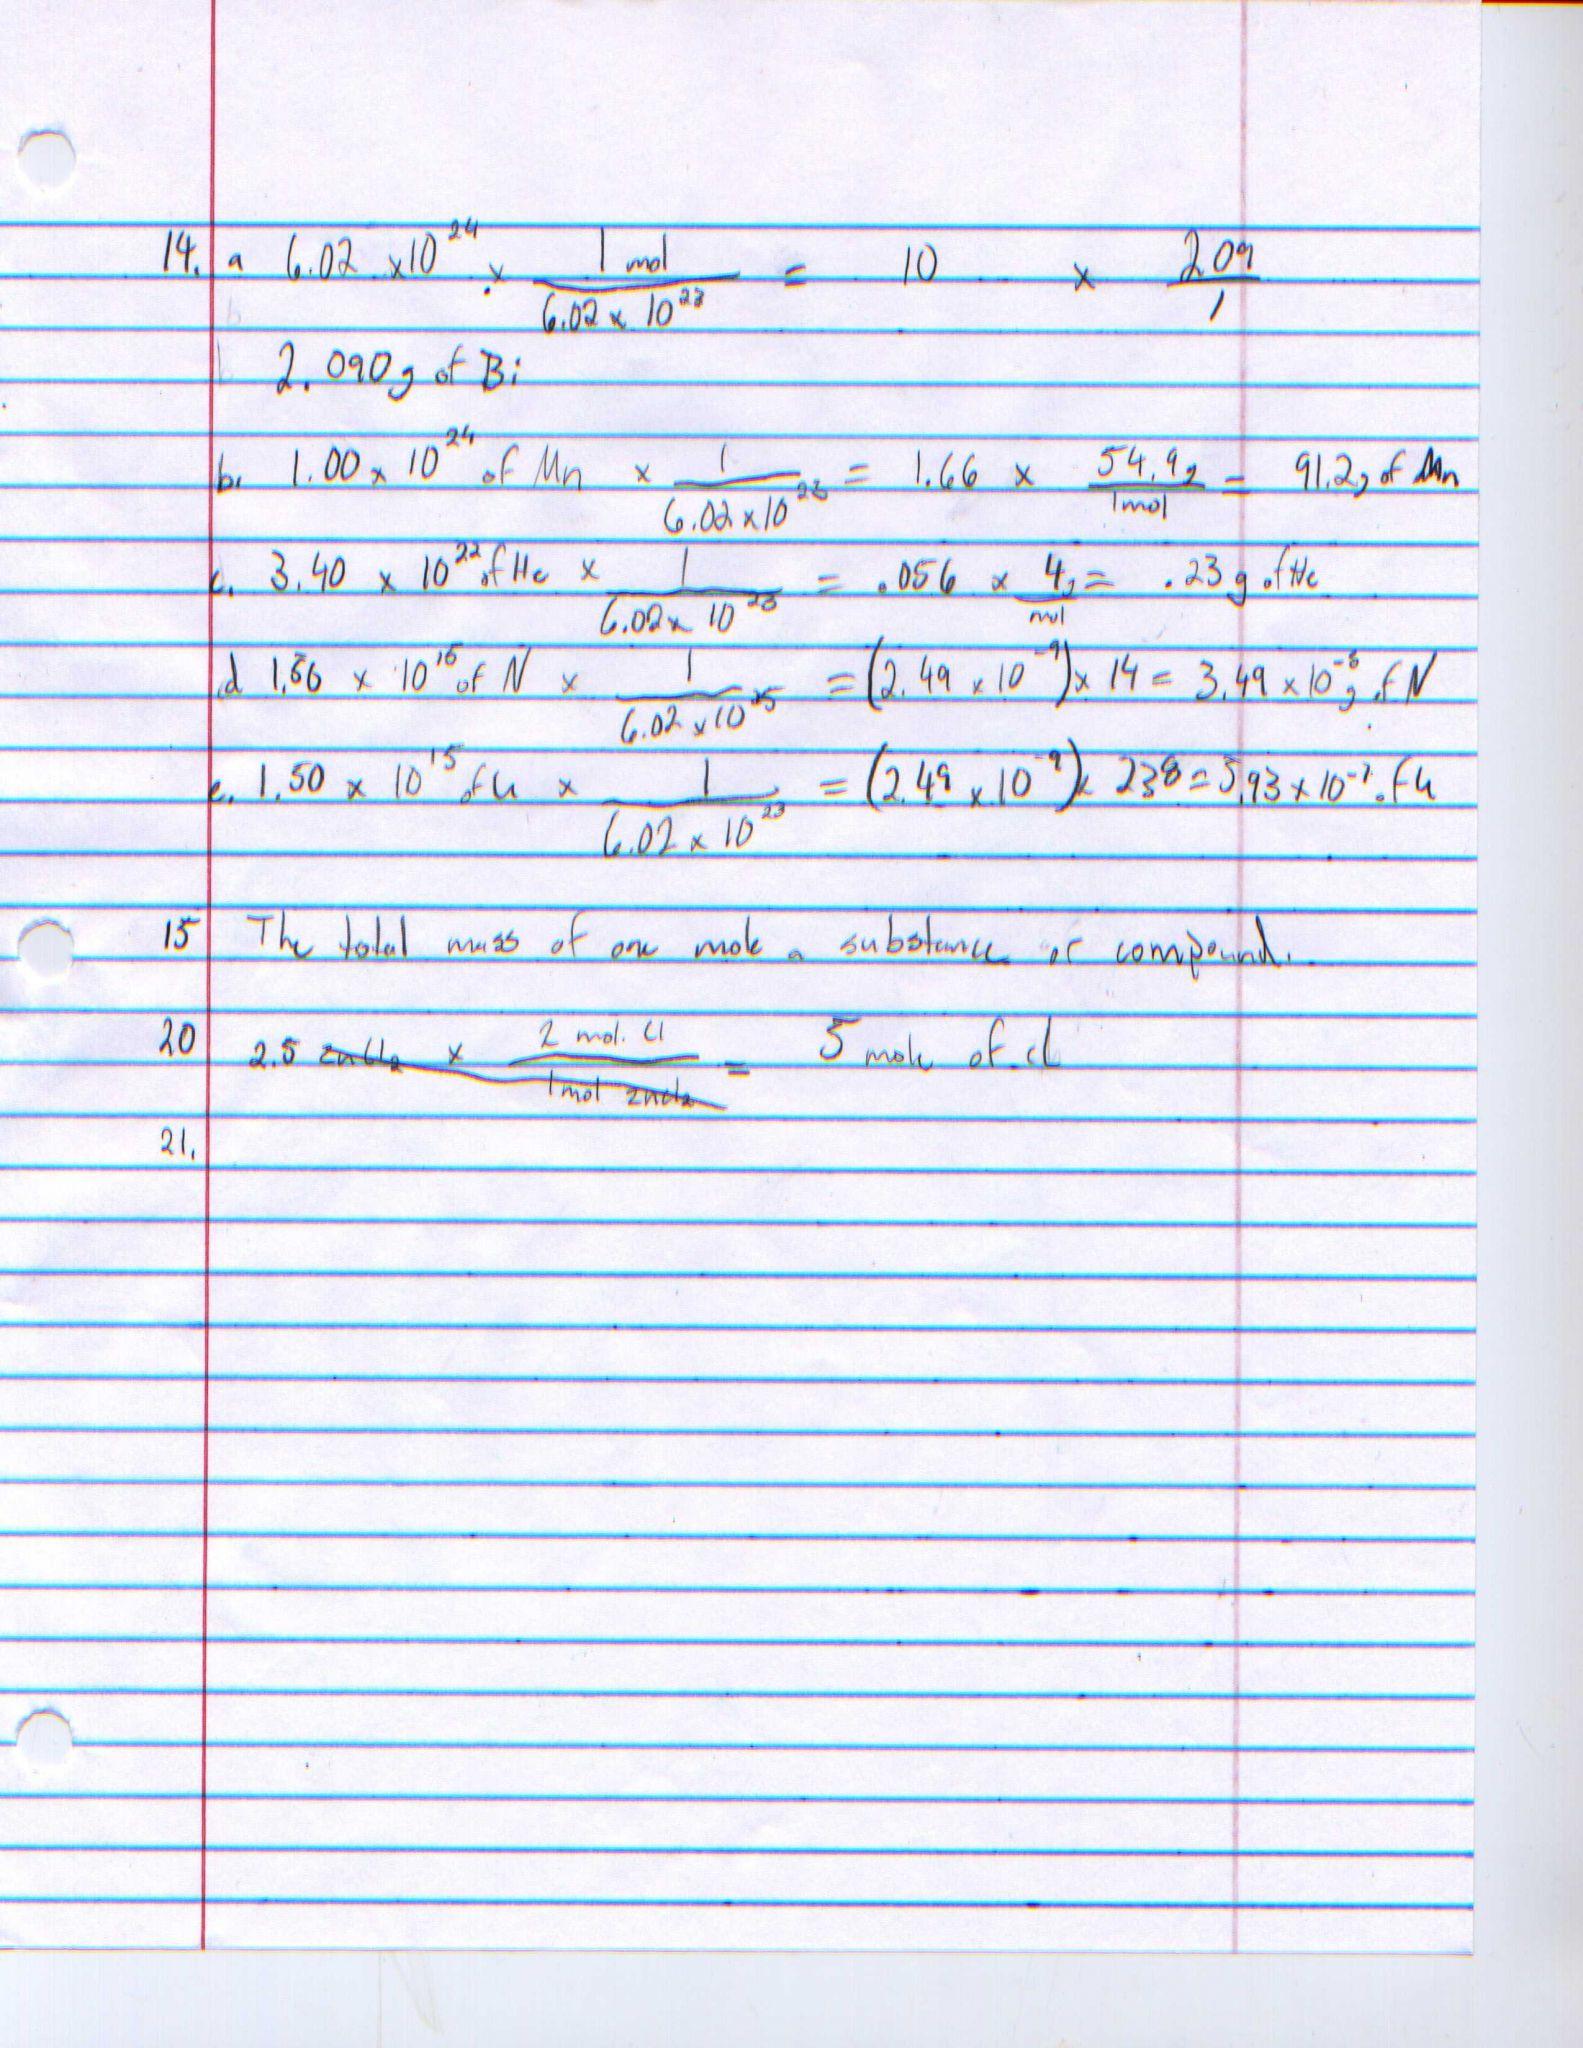 Worksheet 10 Metallic Bonds Answers | Semesprit